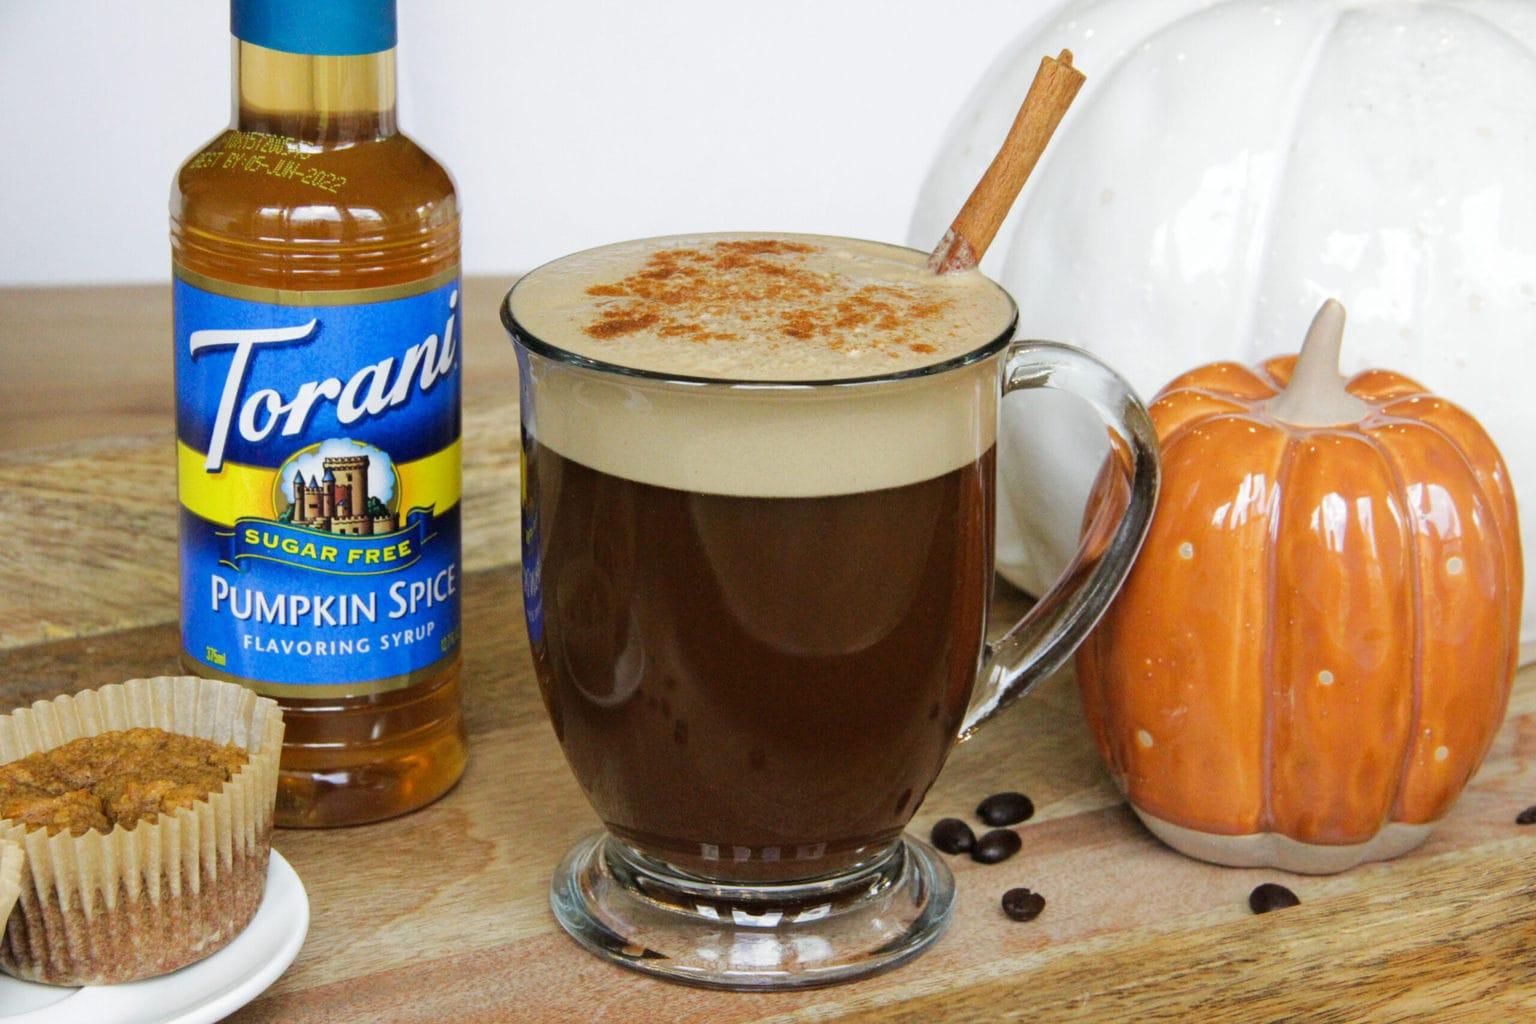 Vegan Keto Pumpkin Spice Latte